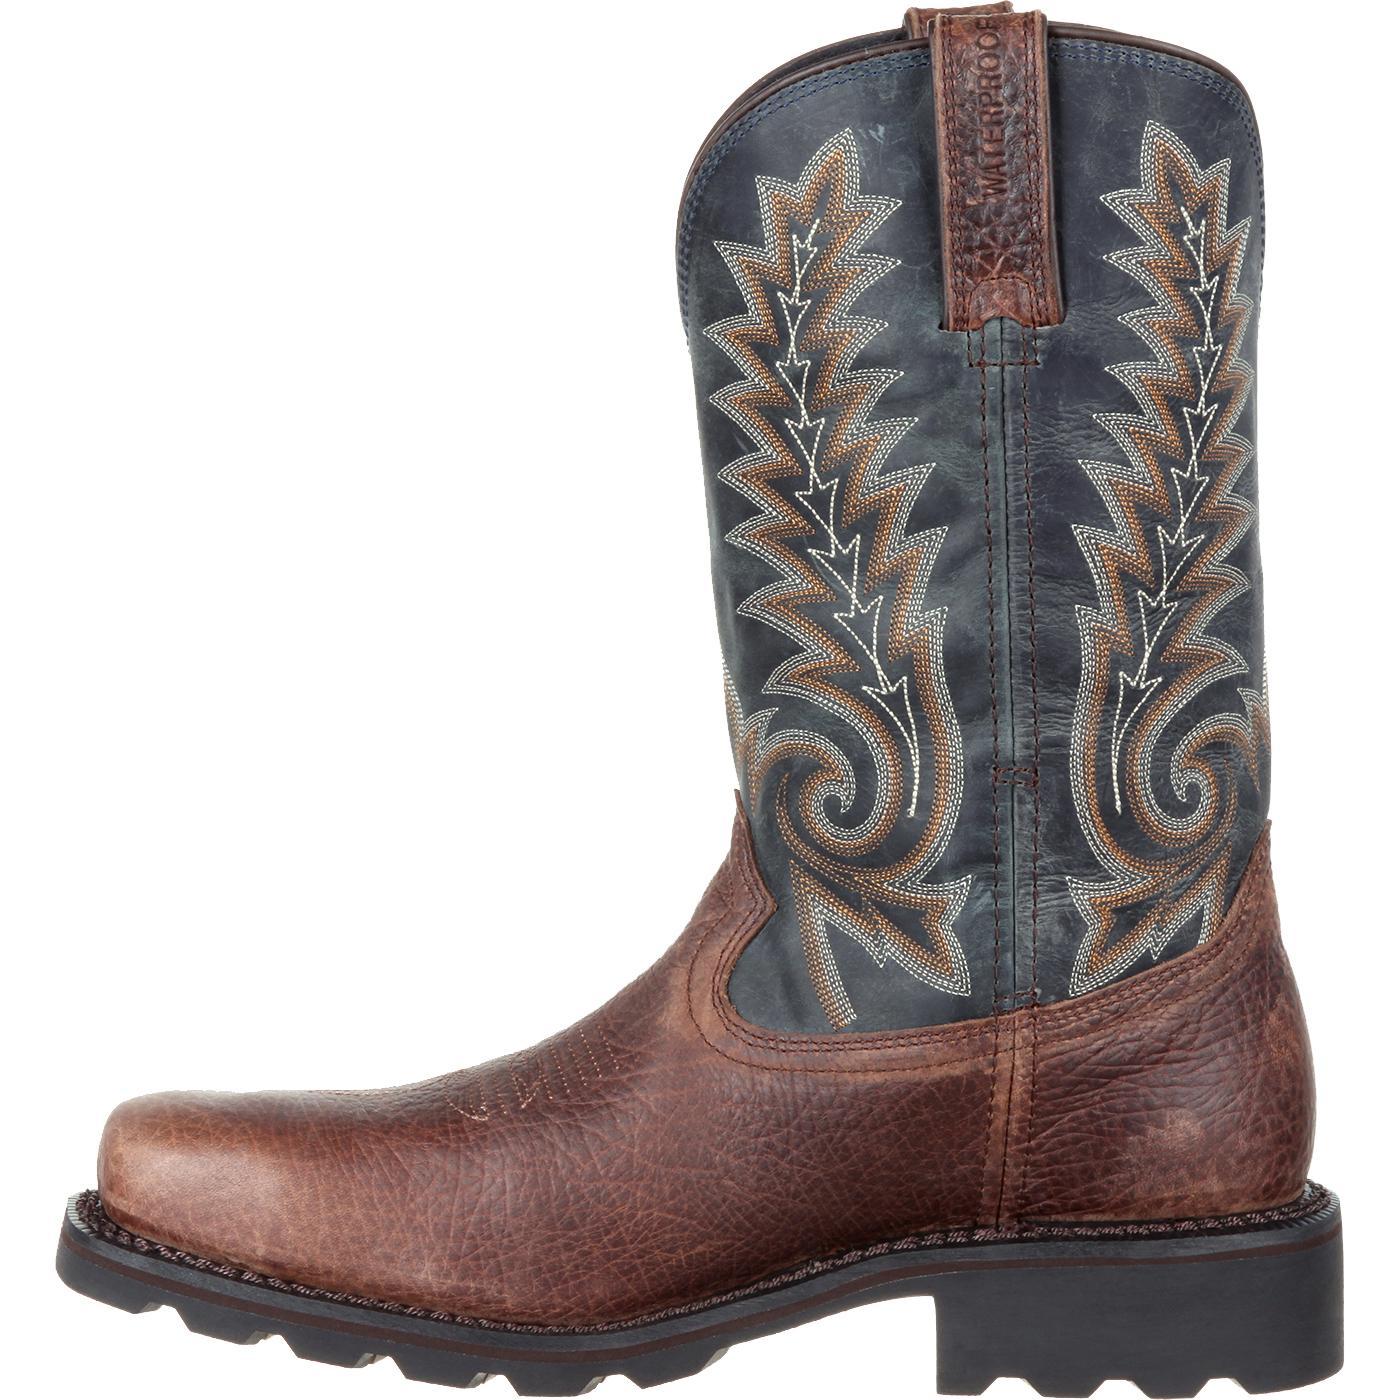 Rocky Gunnison: Men's Comfortable Steel Toe Waterproof Western Boot